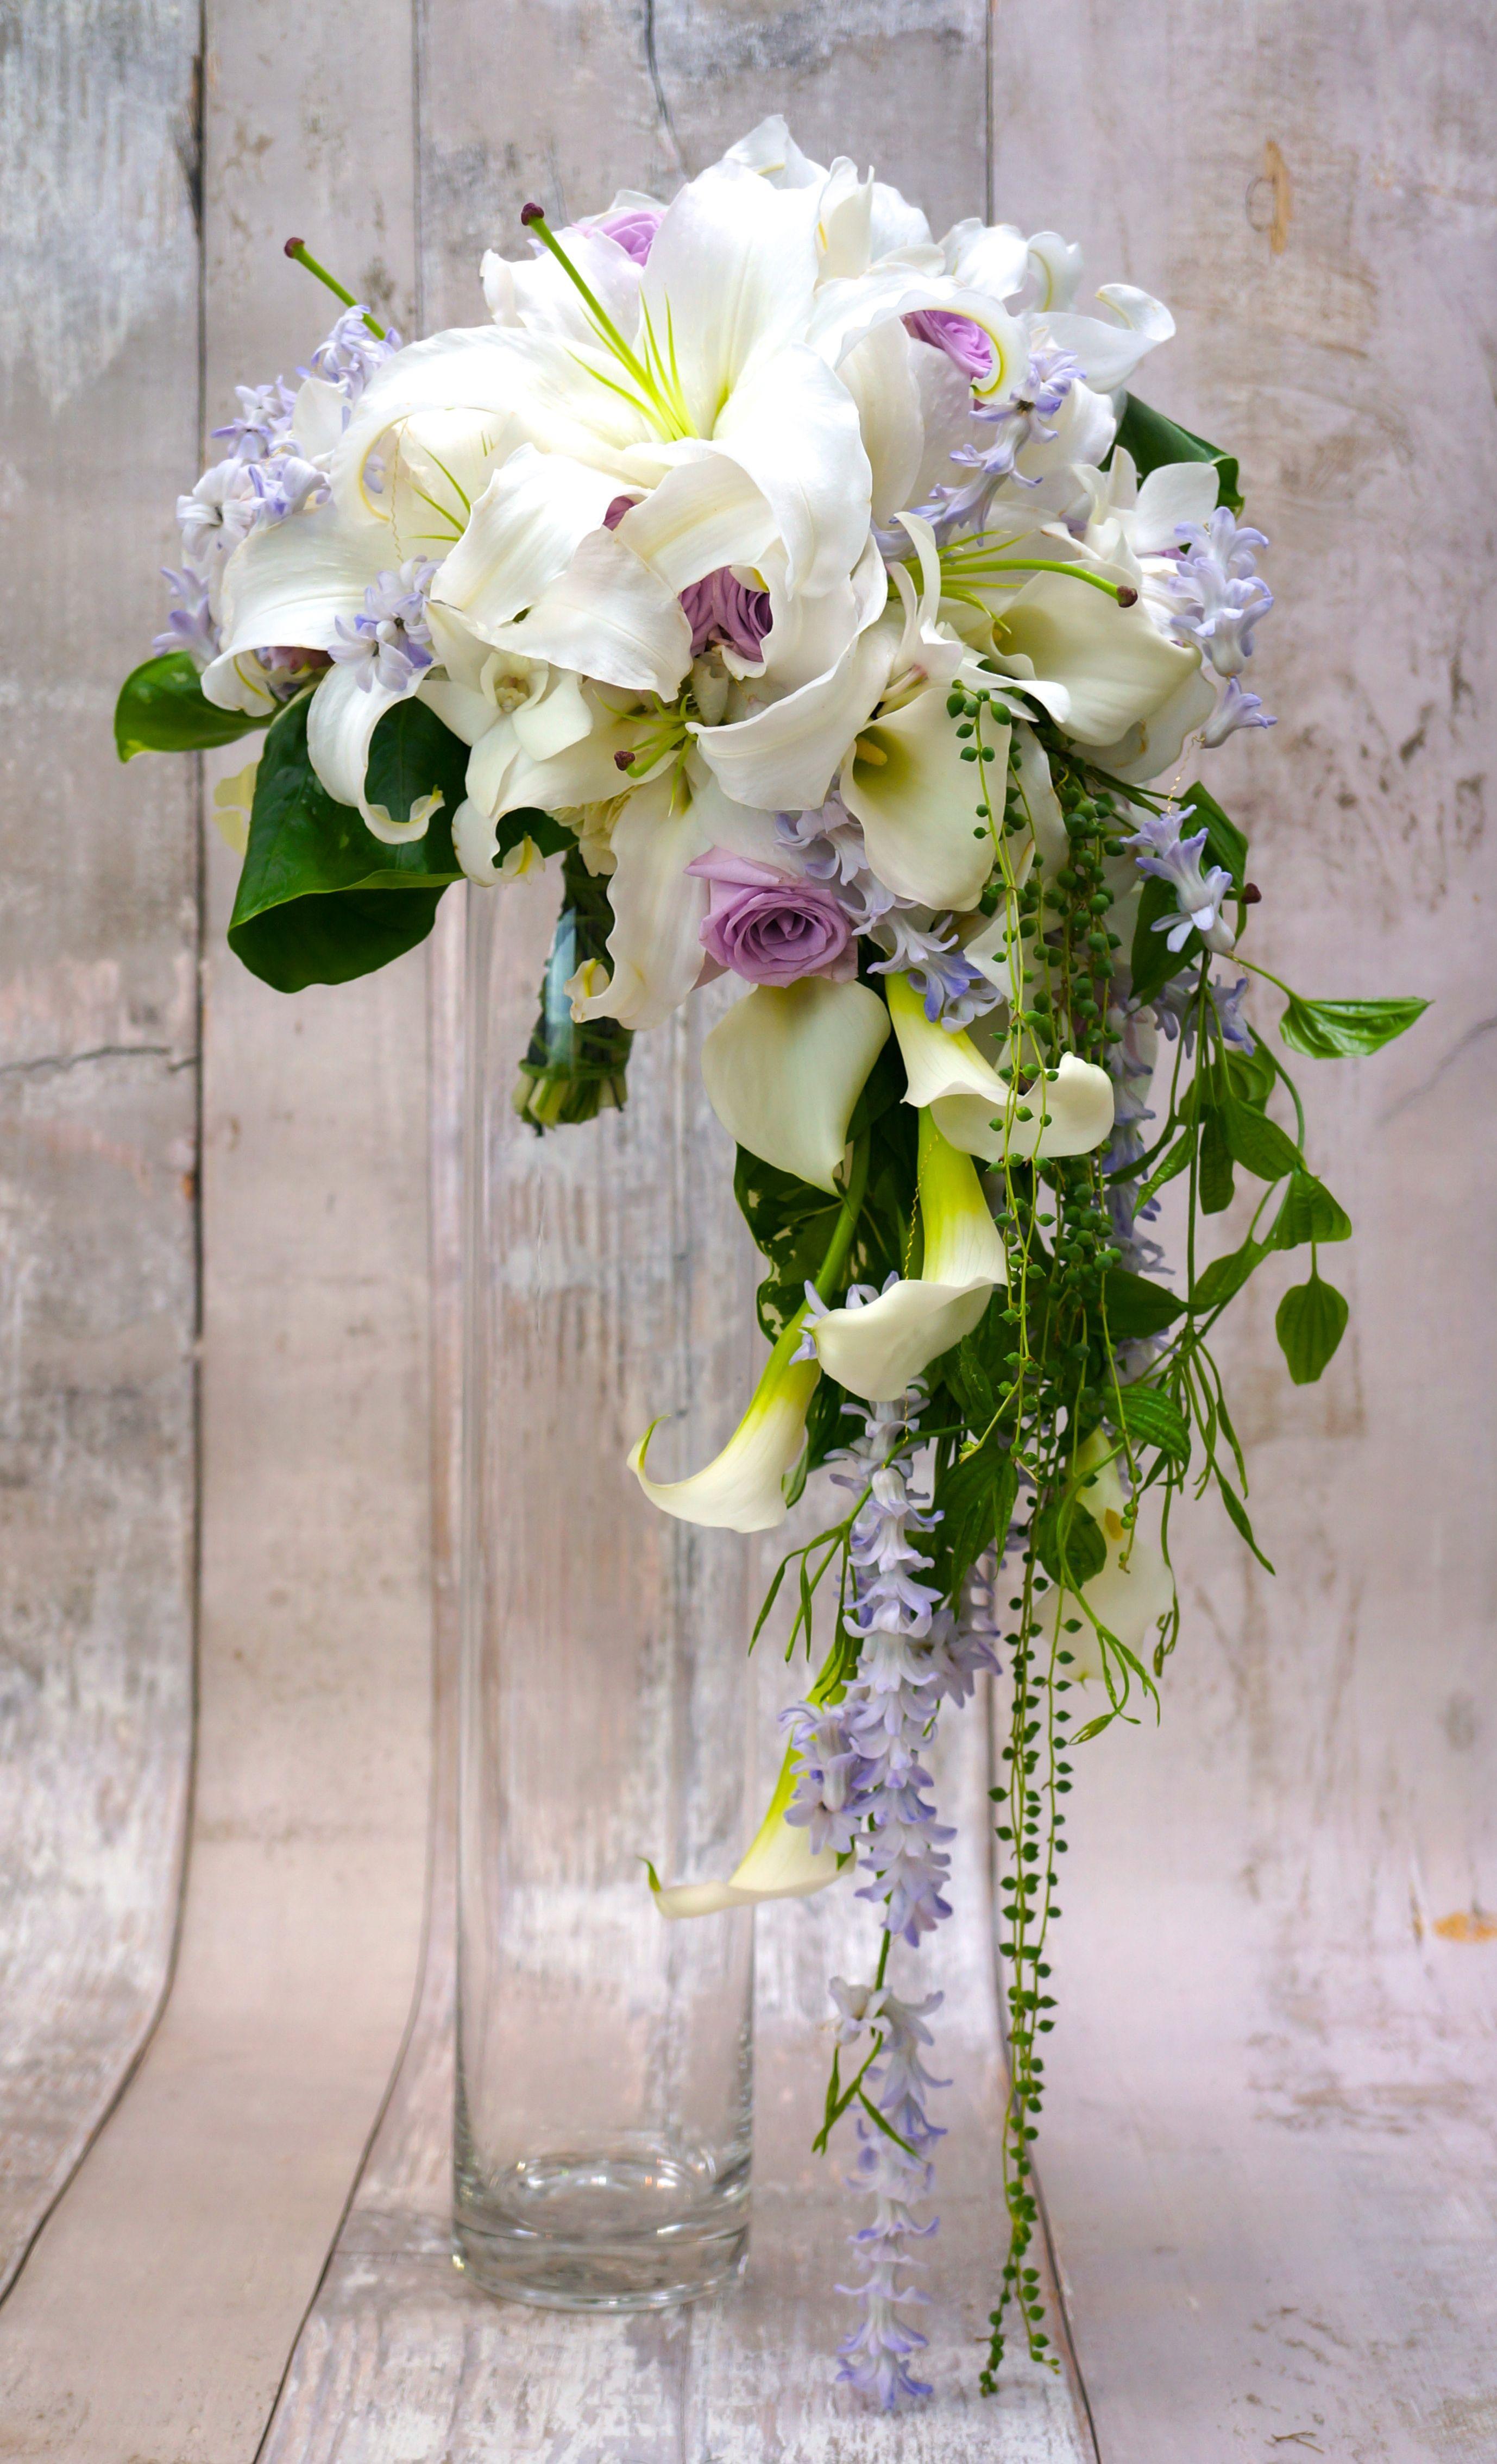 Crescent Cascading Bridal Bouquet With Lilies, Callas, Hyacinth, Etc Sakie